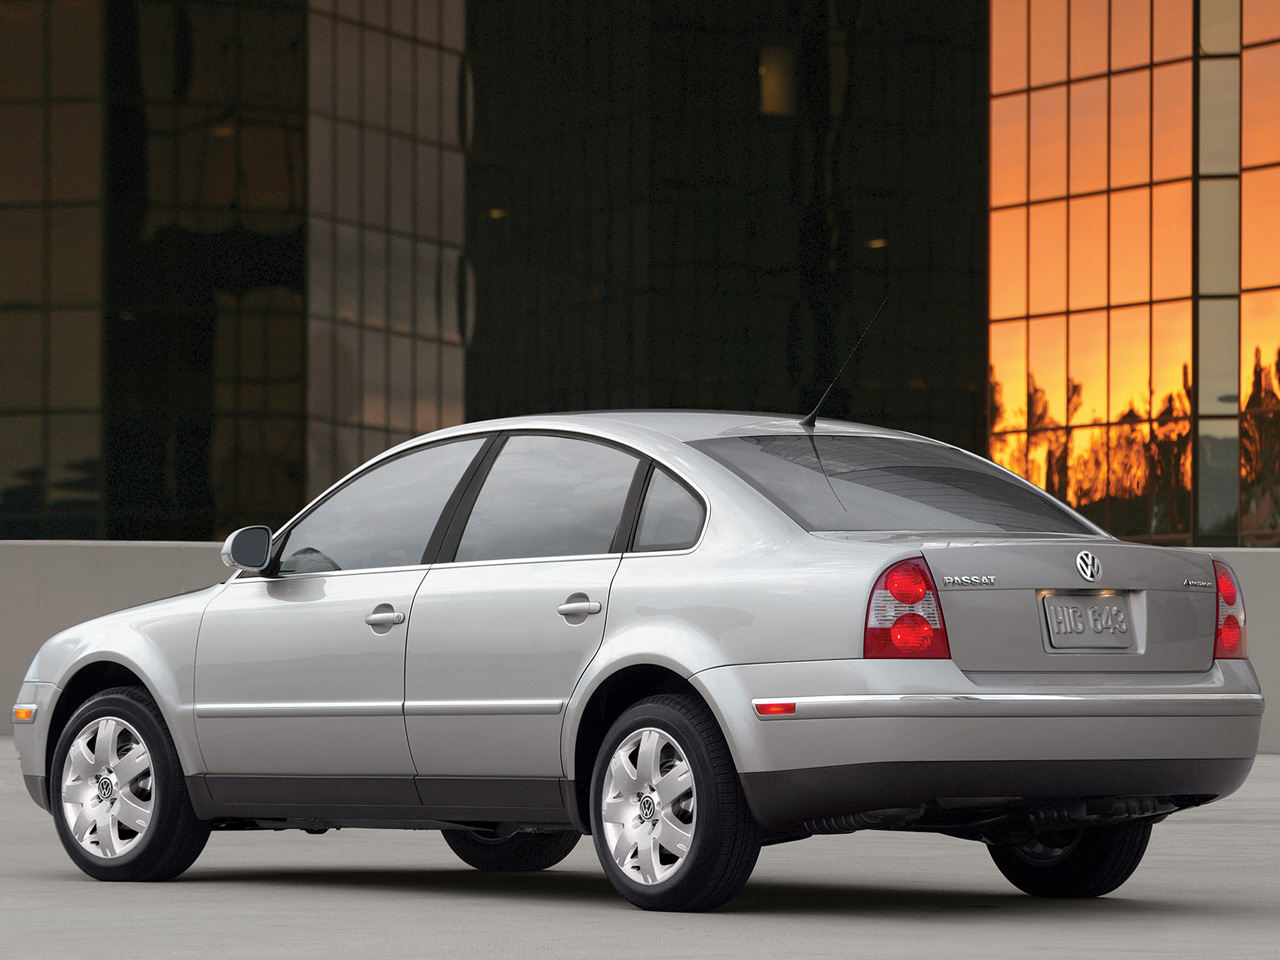 All Types passat 2000 : Volkswagen Passat photos - Photo Gallery Page #22| CarsBase.com